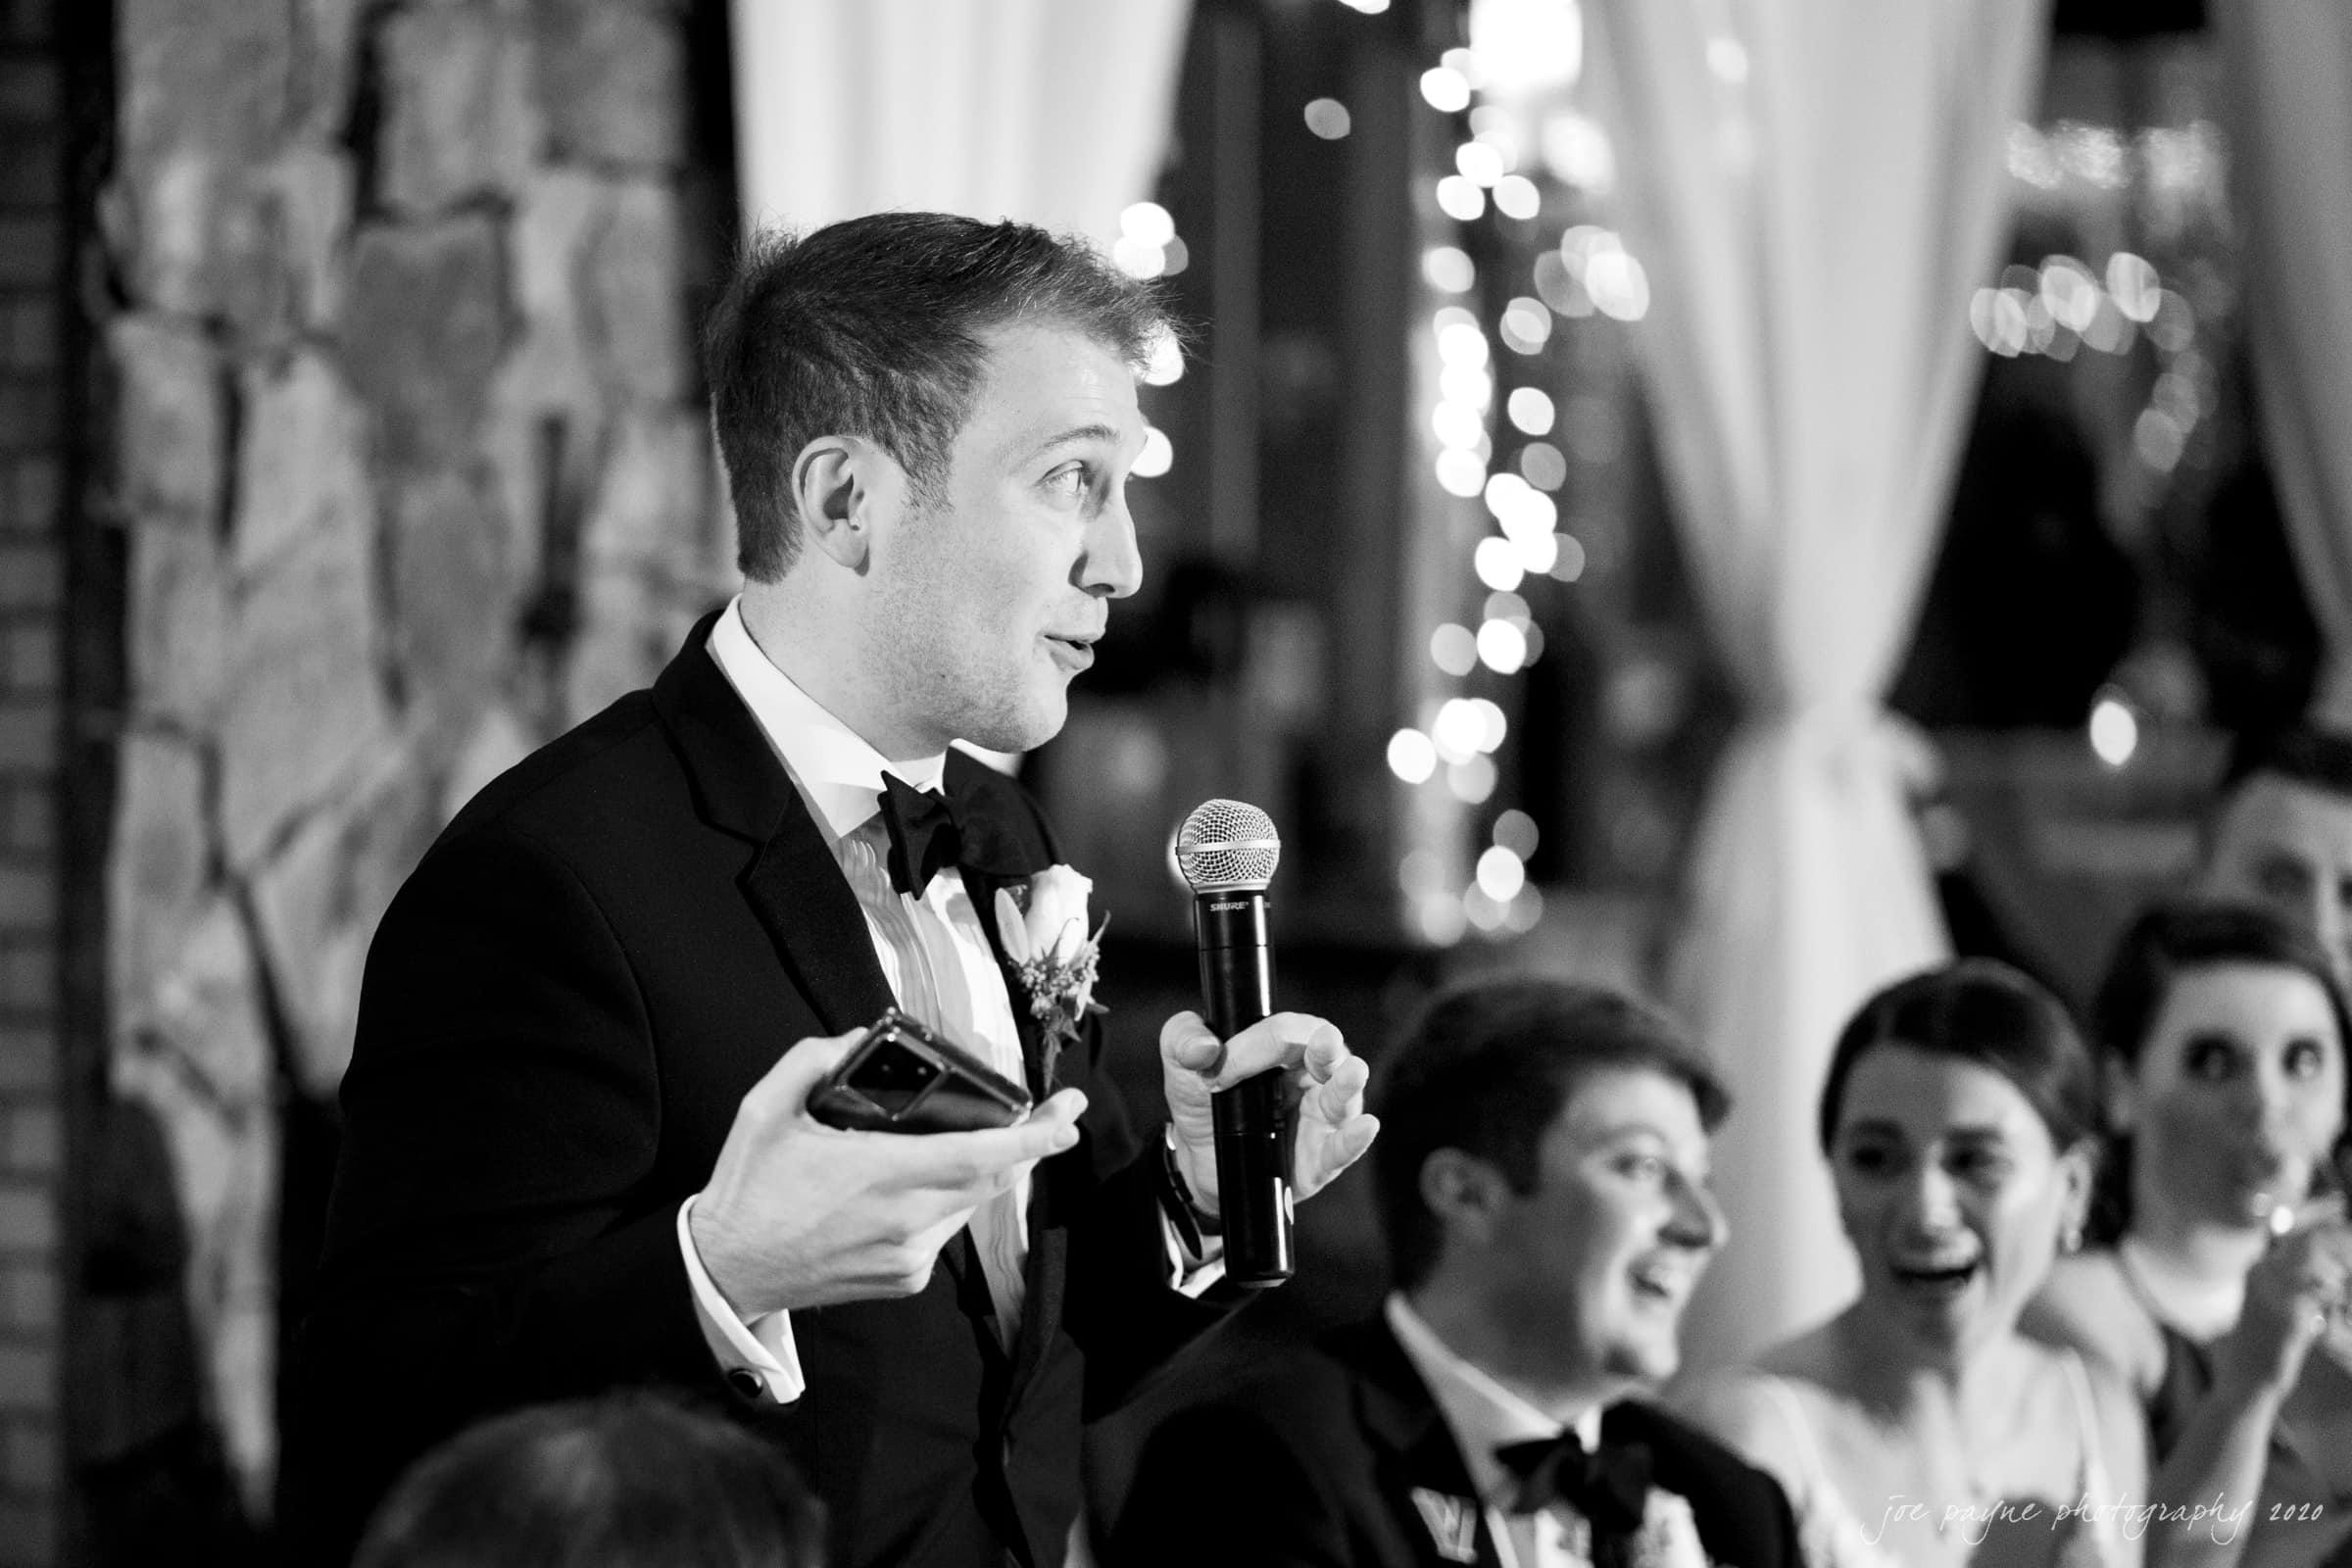 Pavilion at Angus Barn Wedding best man speech